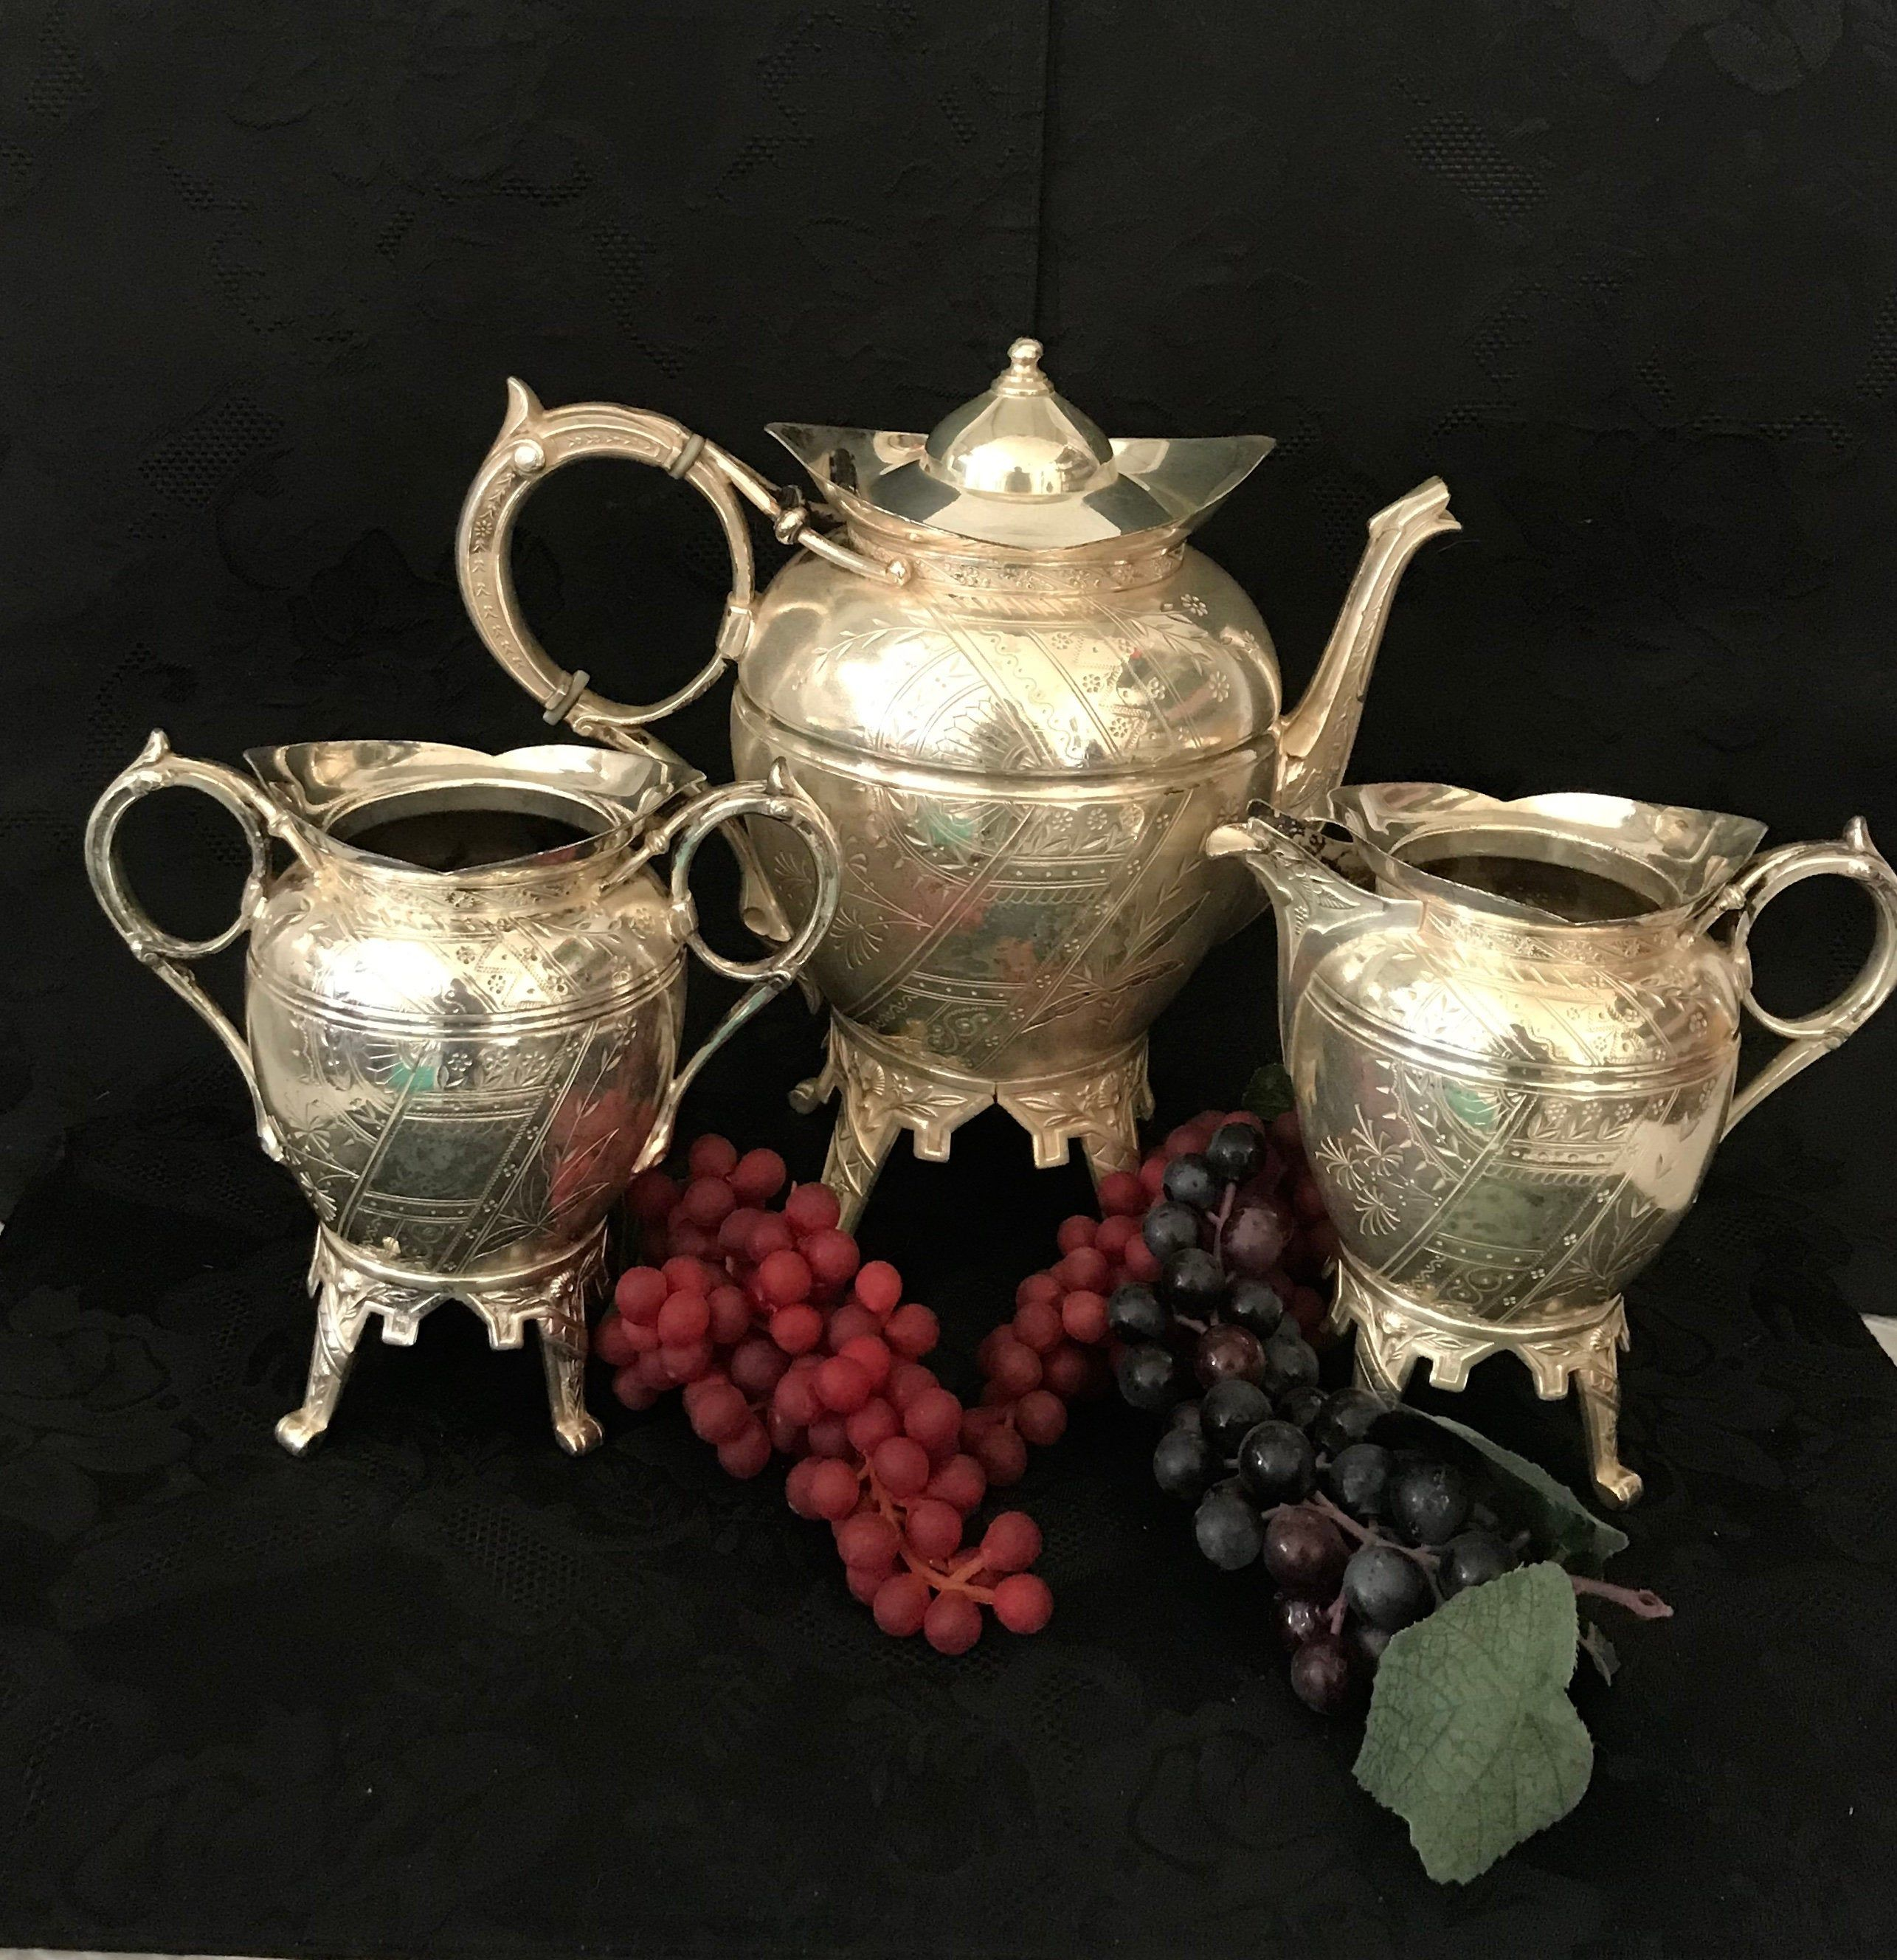 Teapot set service silver dinnerware tea kettle coffee pot creamer / sugar bowl 1893 1/2  Meriden Britannia Co Victorian turn of the century #teapotset